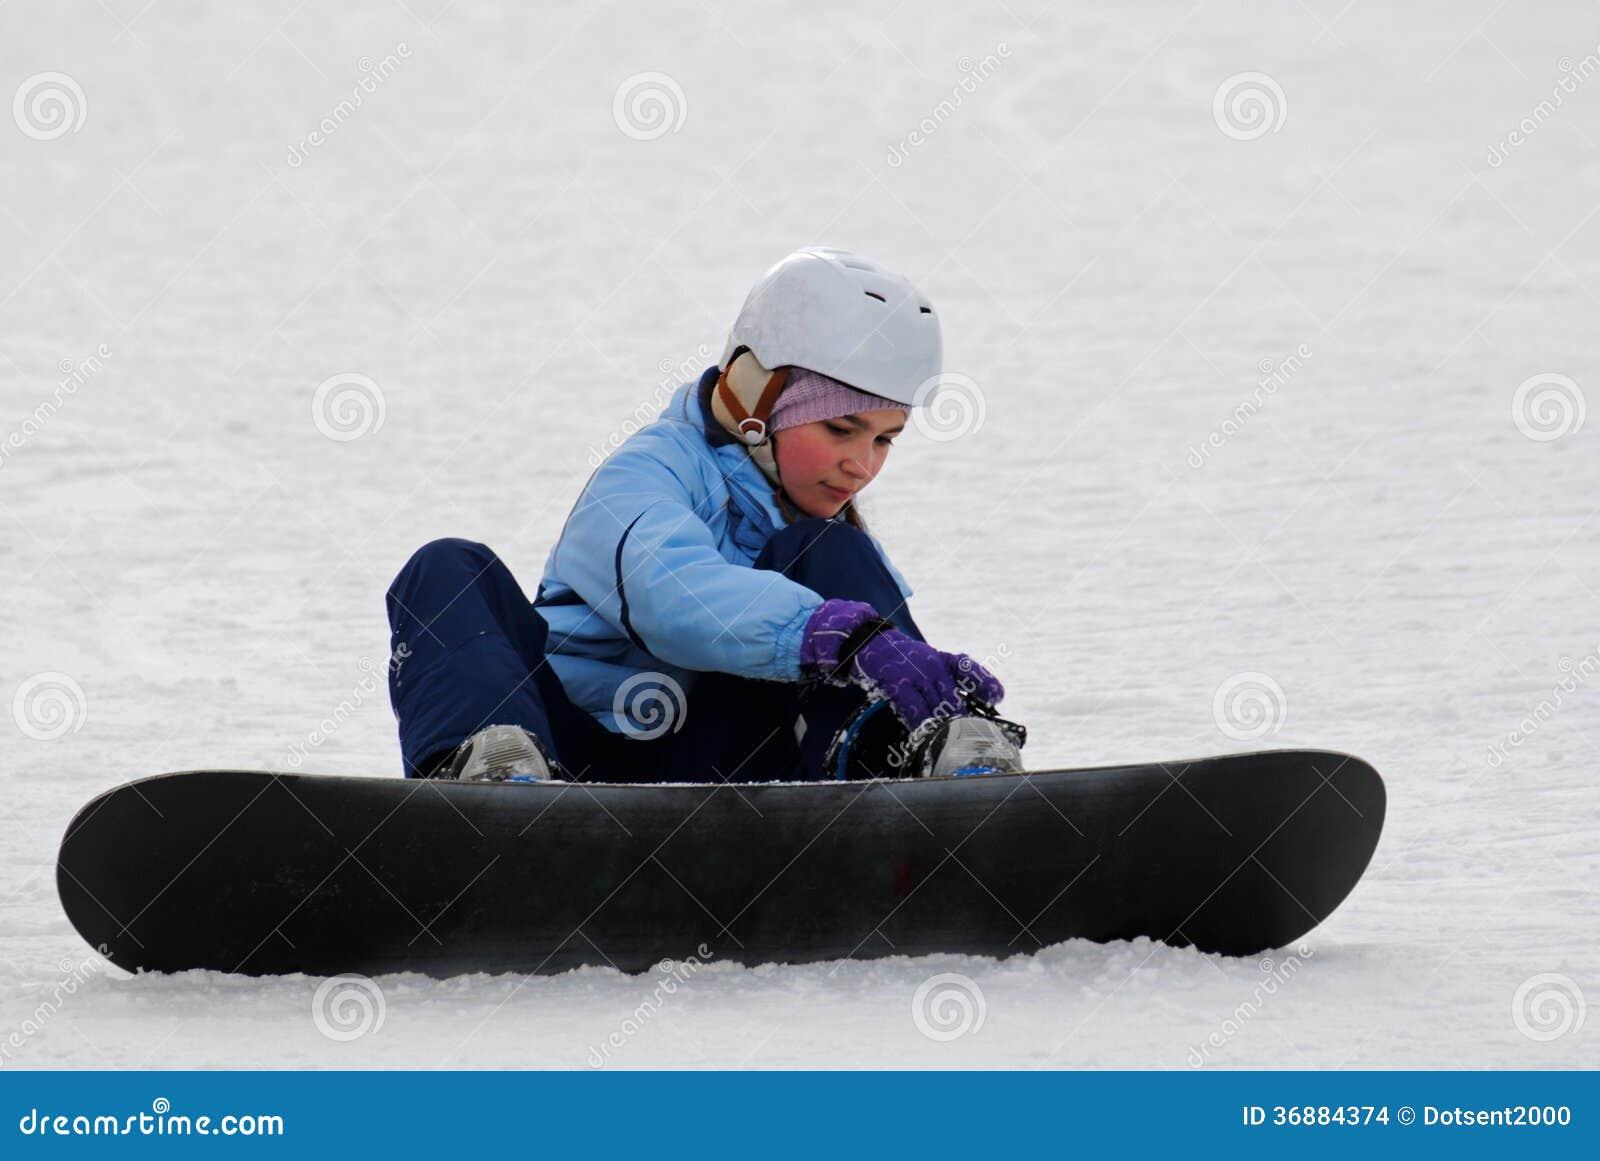 Snowboarder novo